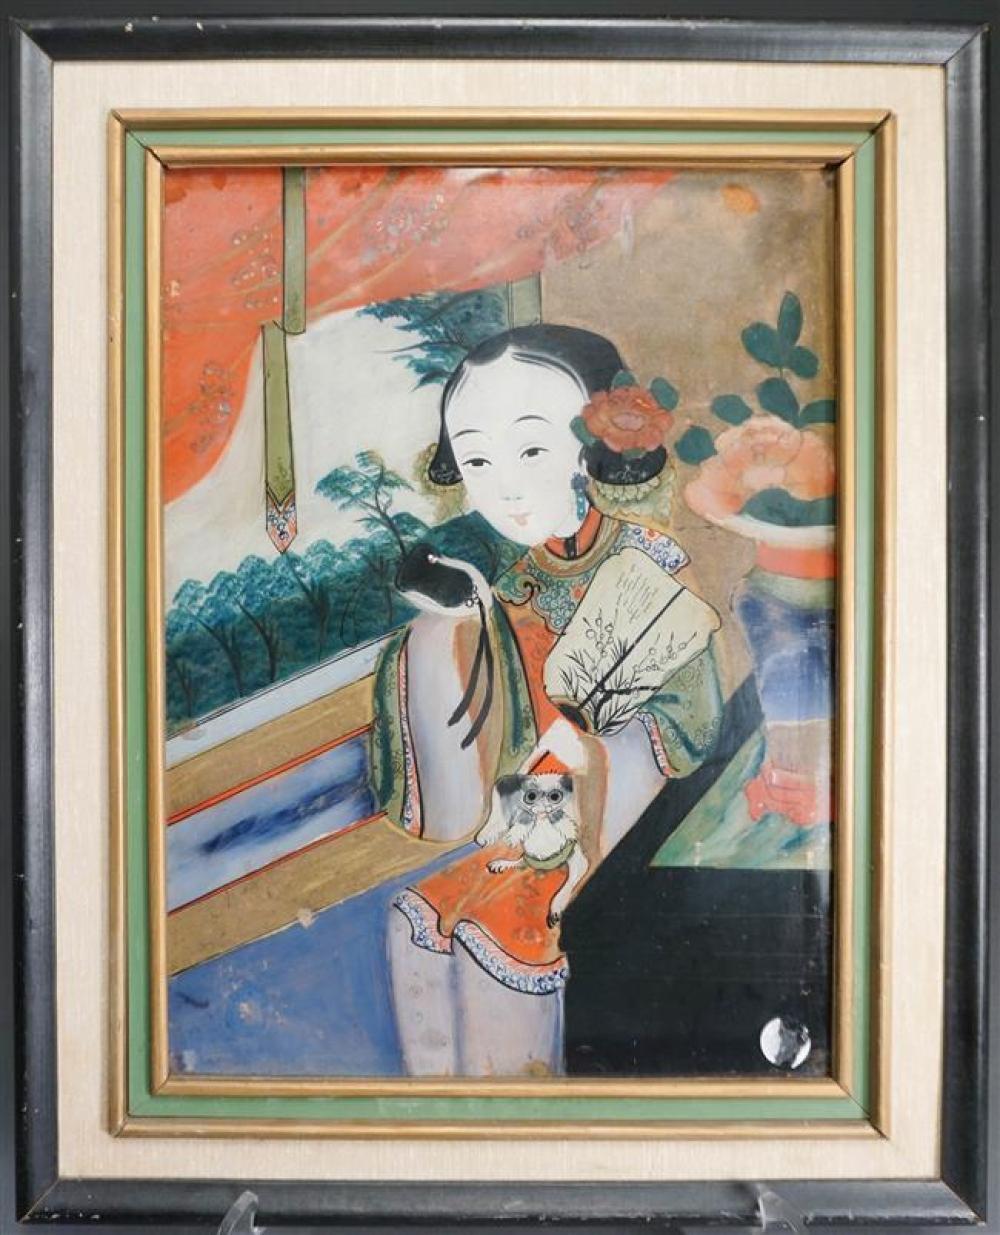 Chinese Export Eglomise Portrait of Lady with Pekingese Dog, Frame: 21 x 17-1/8 in